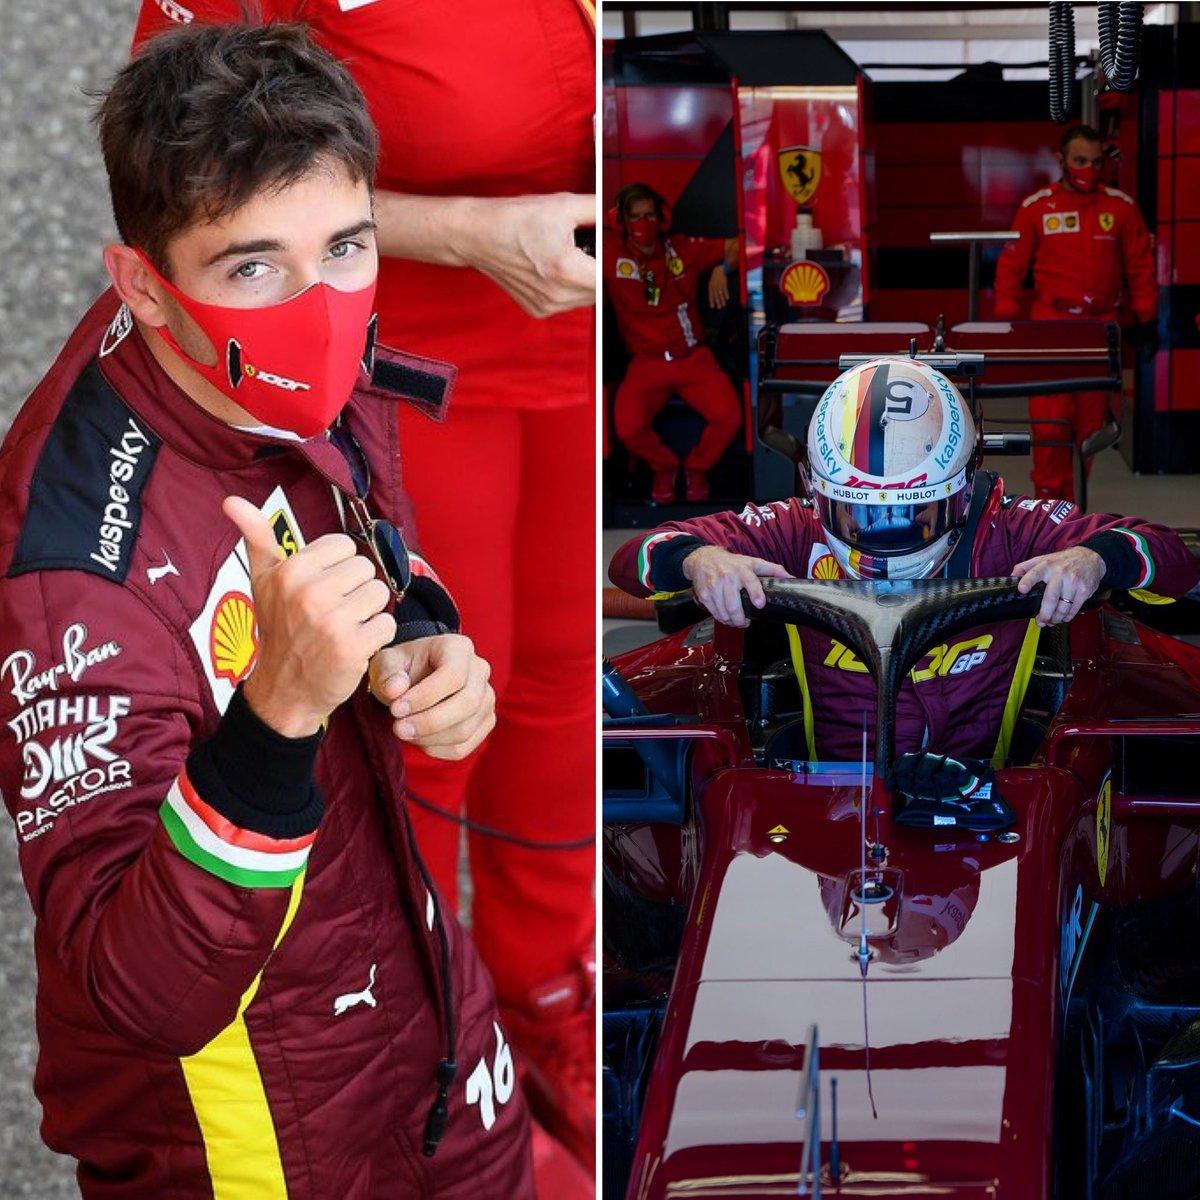 Leclerc 9th & Vettel 10th at the Tuscan GP 2020 #Tifosi #TuscanGP #essereFerrari #Ferrari #SF1000 #Charles16 #Seb5 #CL16  #Tifosiclub #F1 #liveyourferraripassion #Vettel #Maranello #forzaferrari  #Skysports https://t.co/Eue1WBirwv